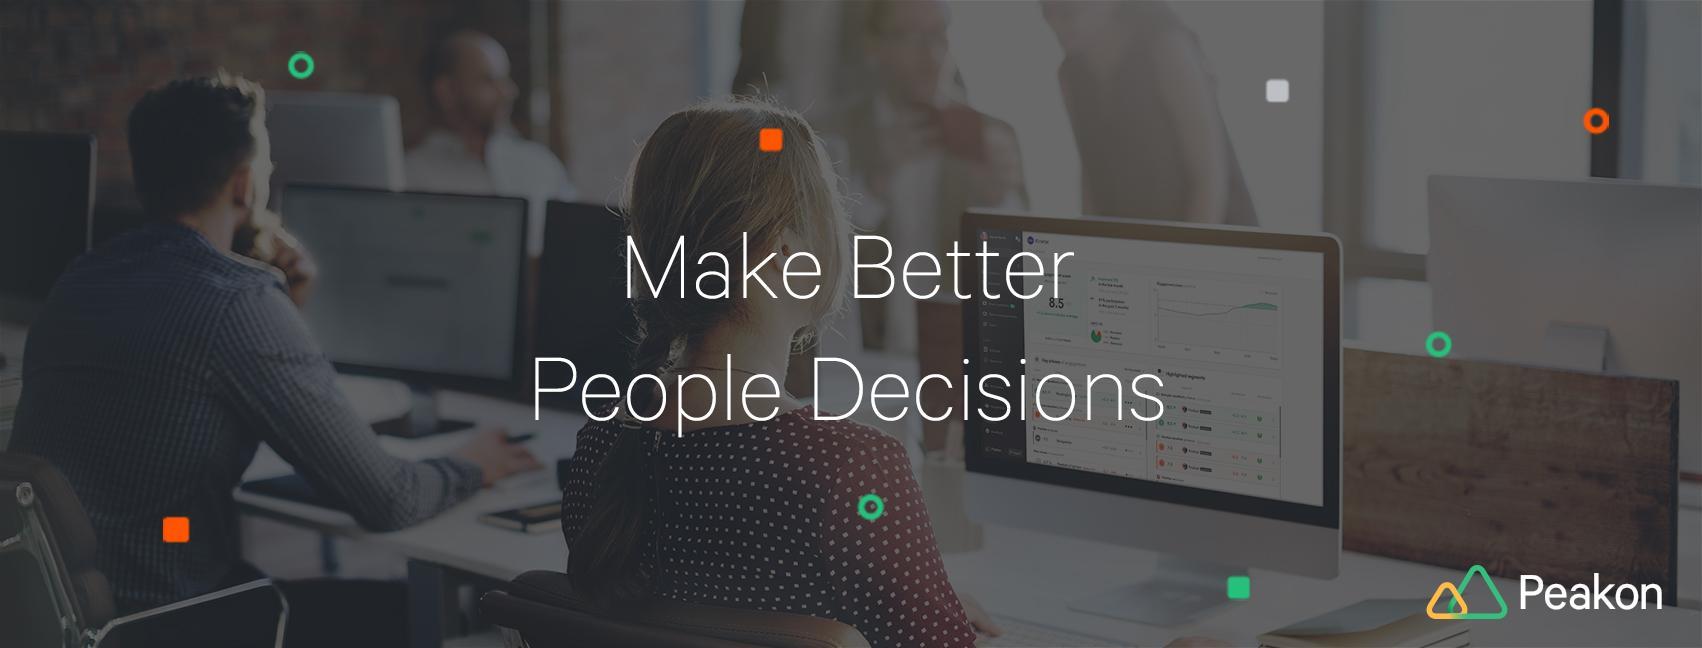 Recensioni Peakon: Software per la gestione questionari HR - appvizer